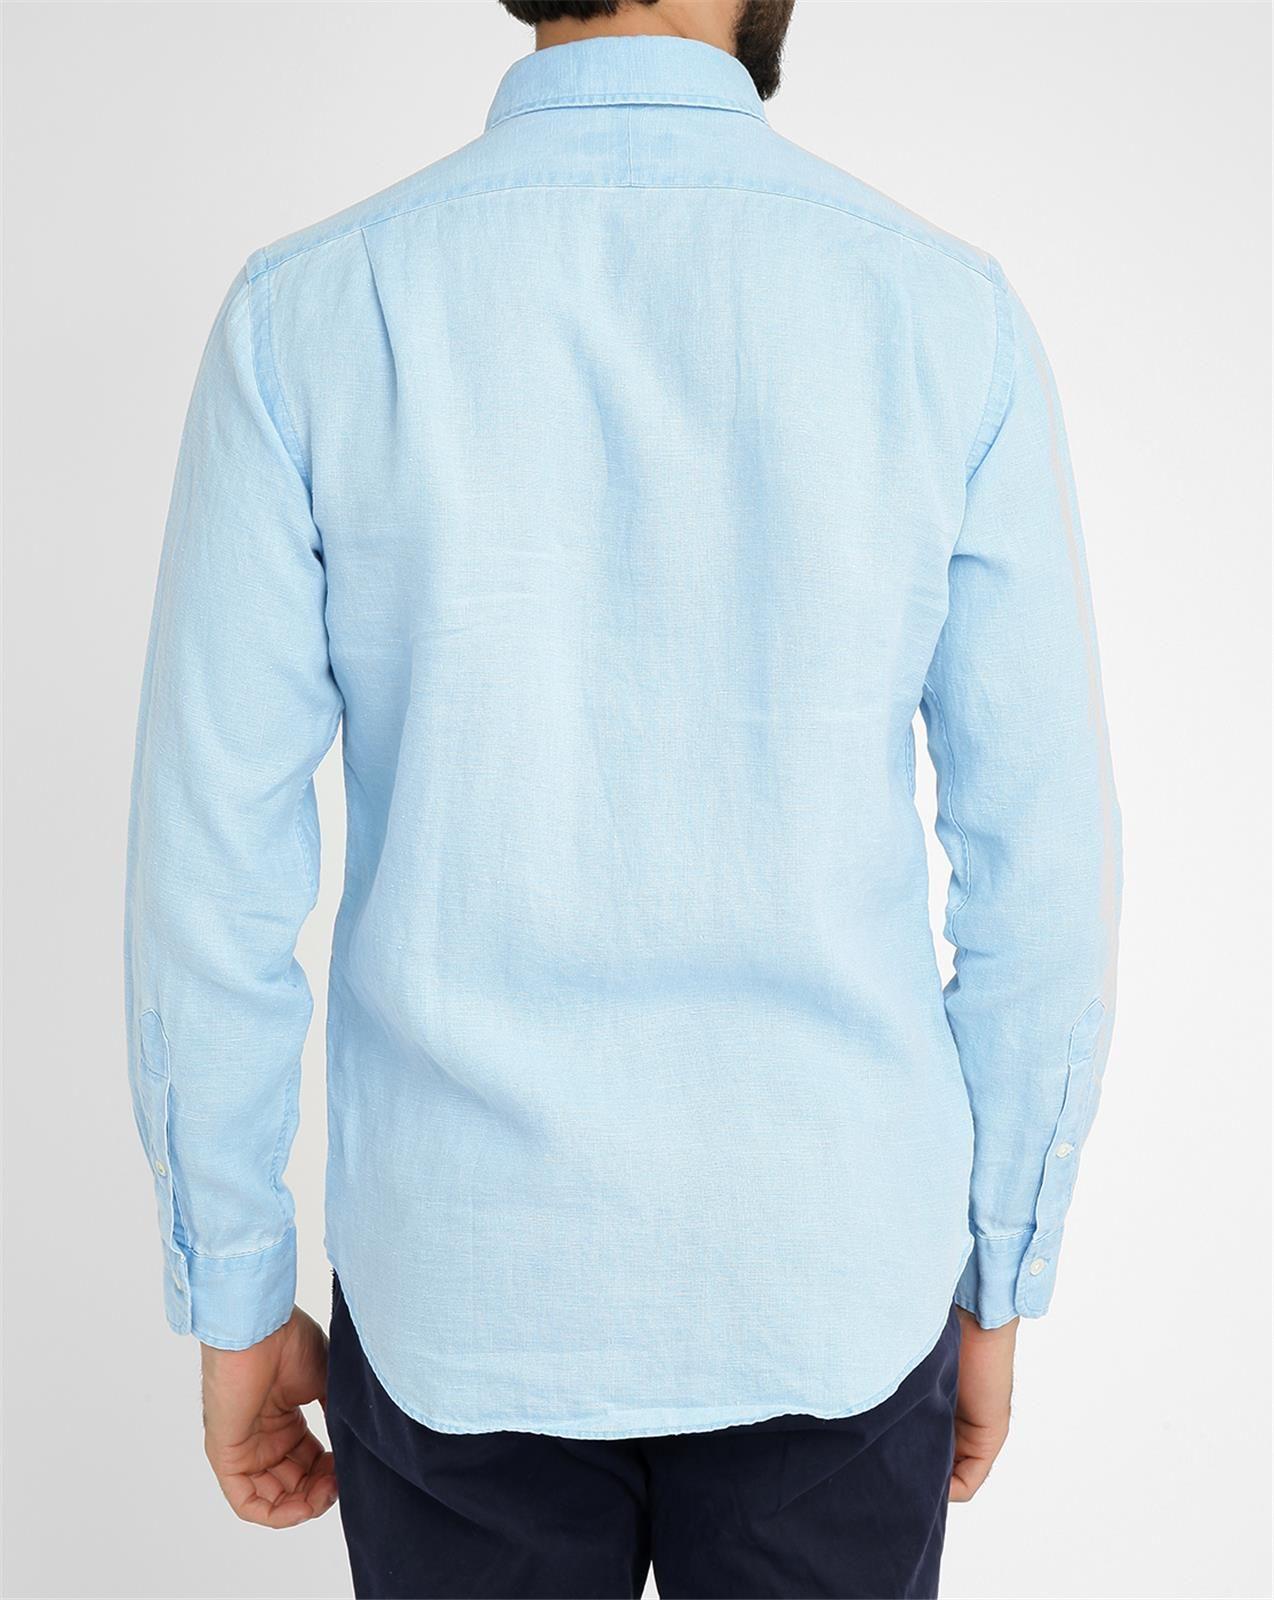 polo ralph lauren sky blue linen slim fit shirt in blue. Black Bedroom Furniture Sets. Home Design Ideas